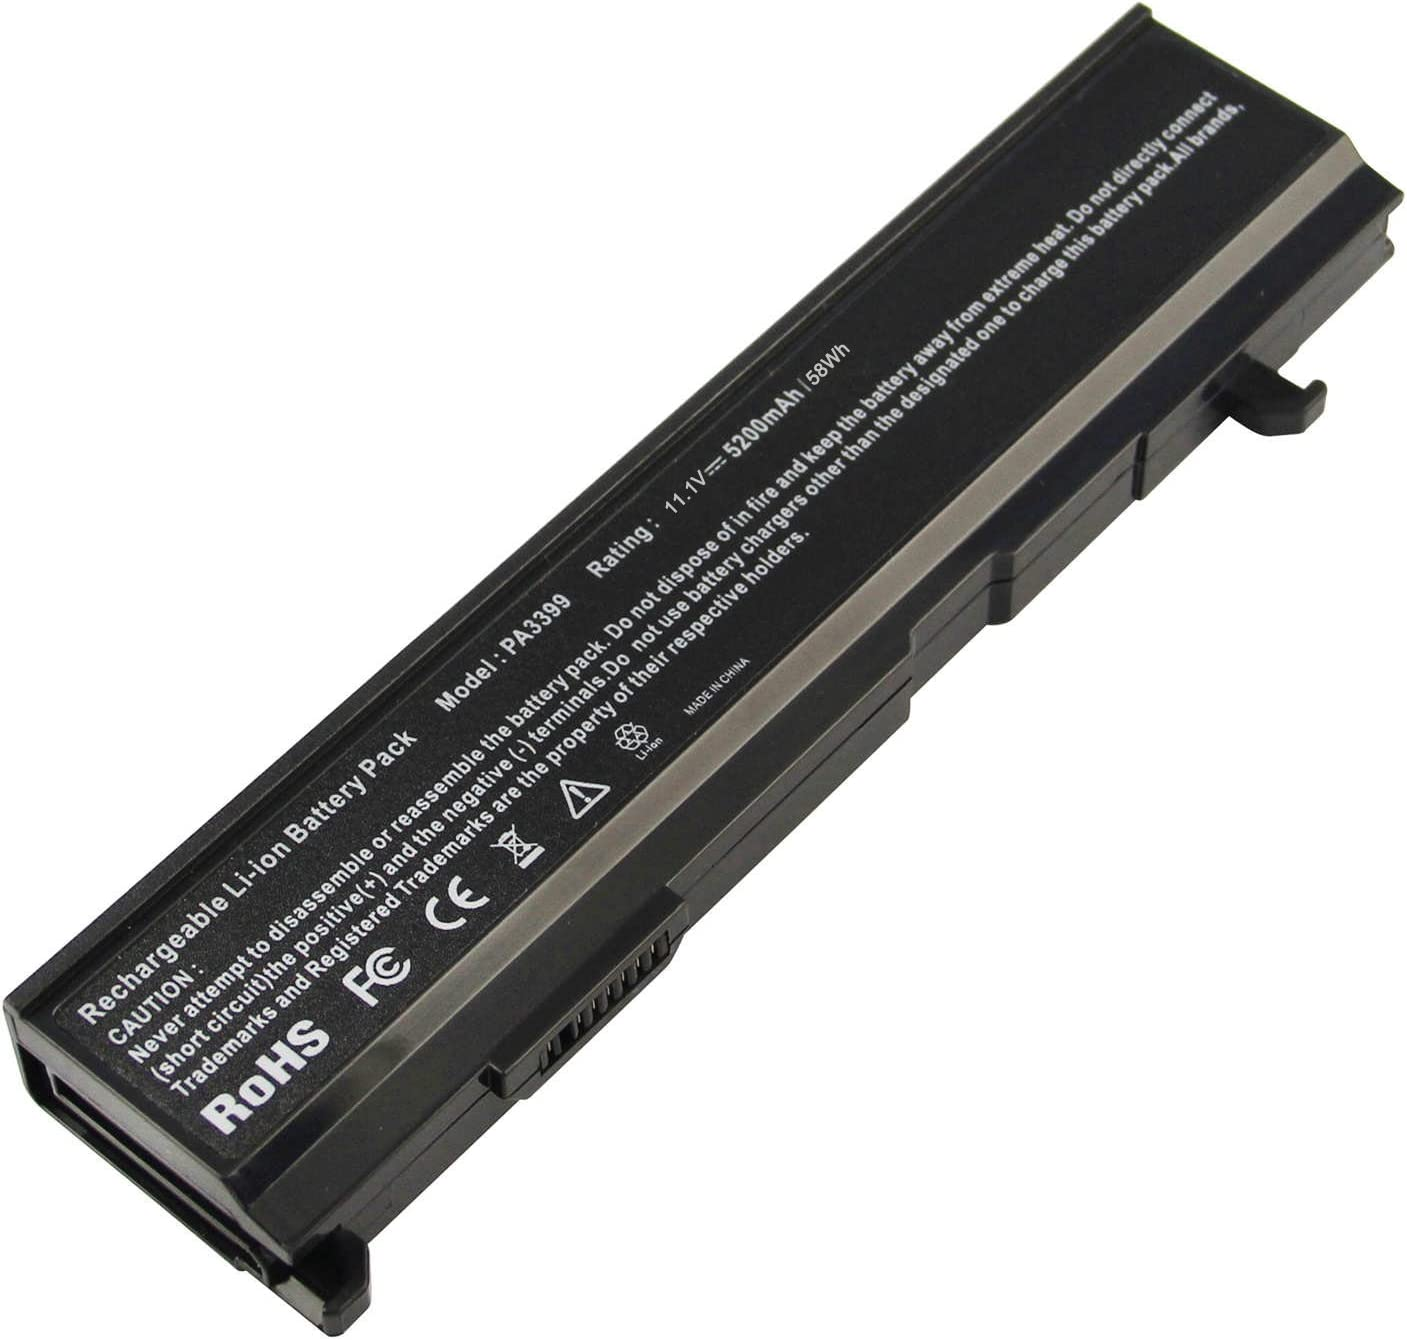 ARyee PA3399U-1BRS Battery Compatible with Toshiba PA3399U-1BAS PA3399U-2BAS PA3400U-1BRS PA3478U-1BRS PABAS057 PABAS076(5200mAh 11.1V)